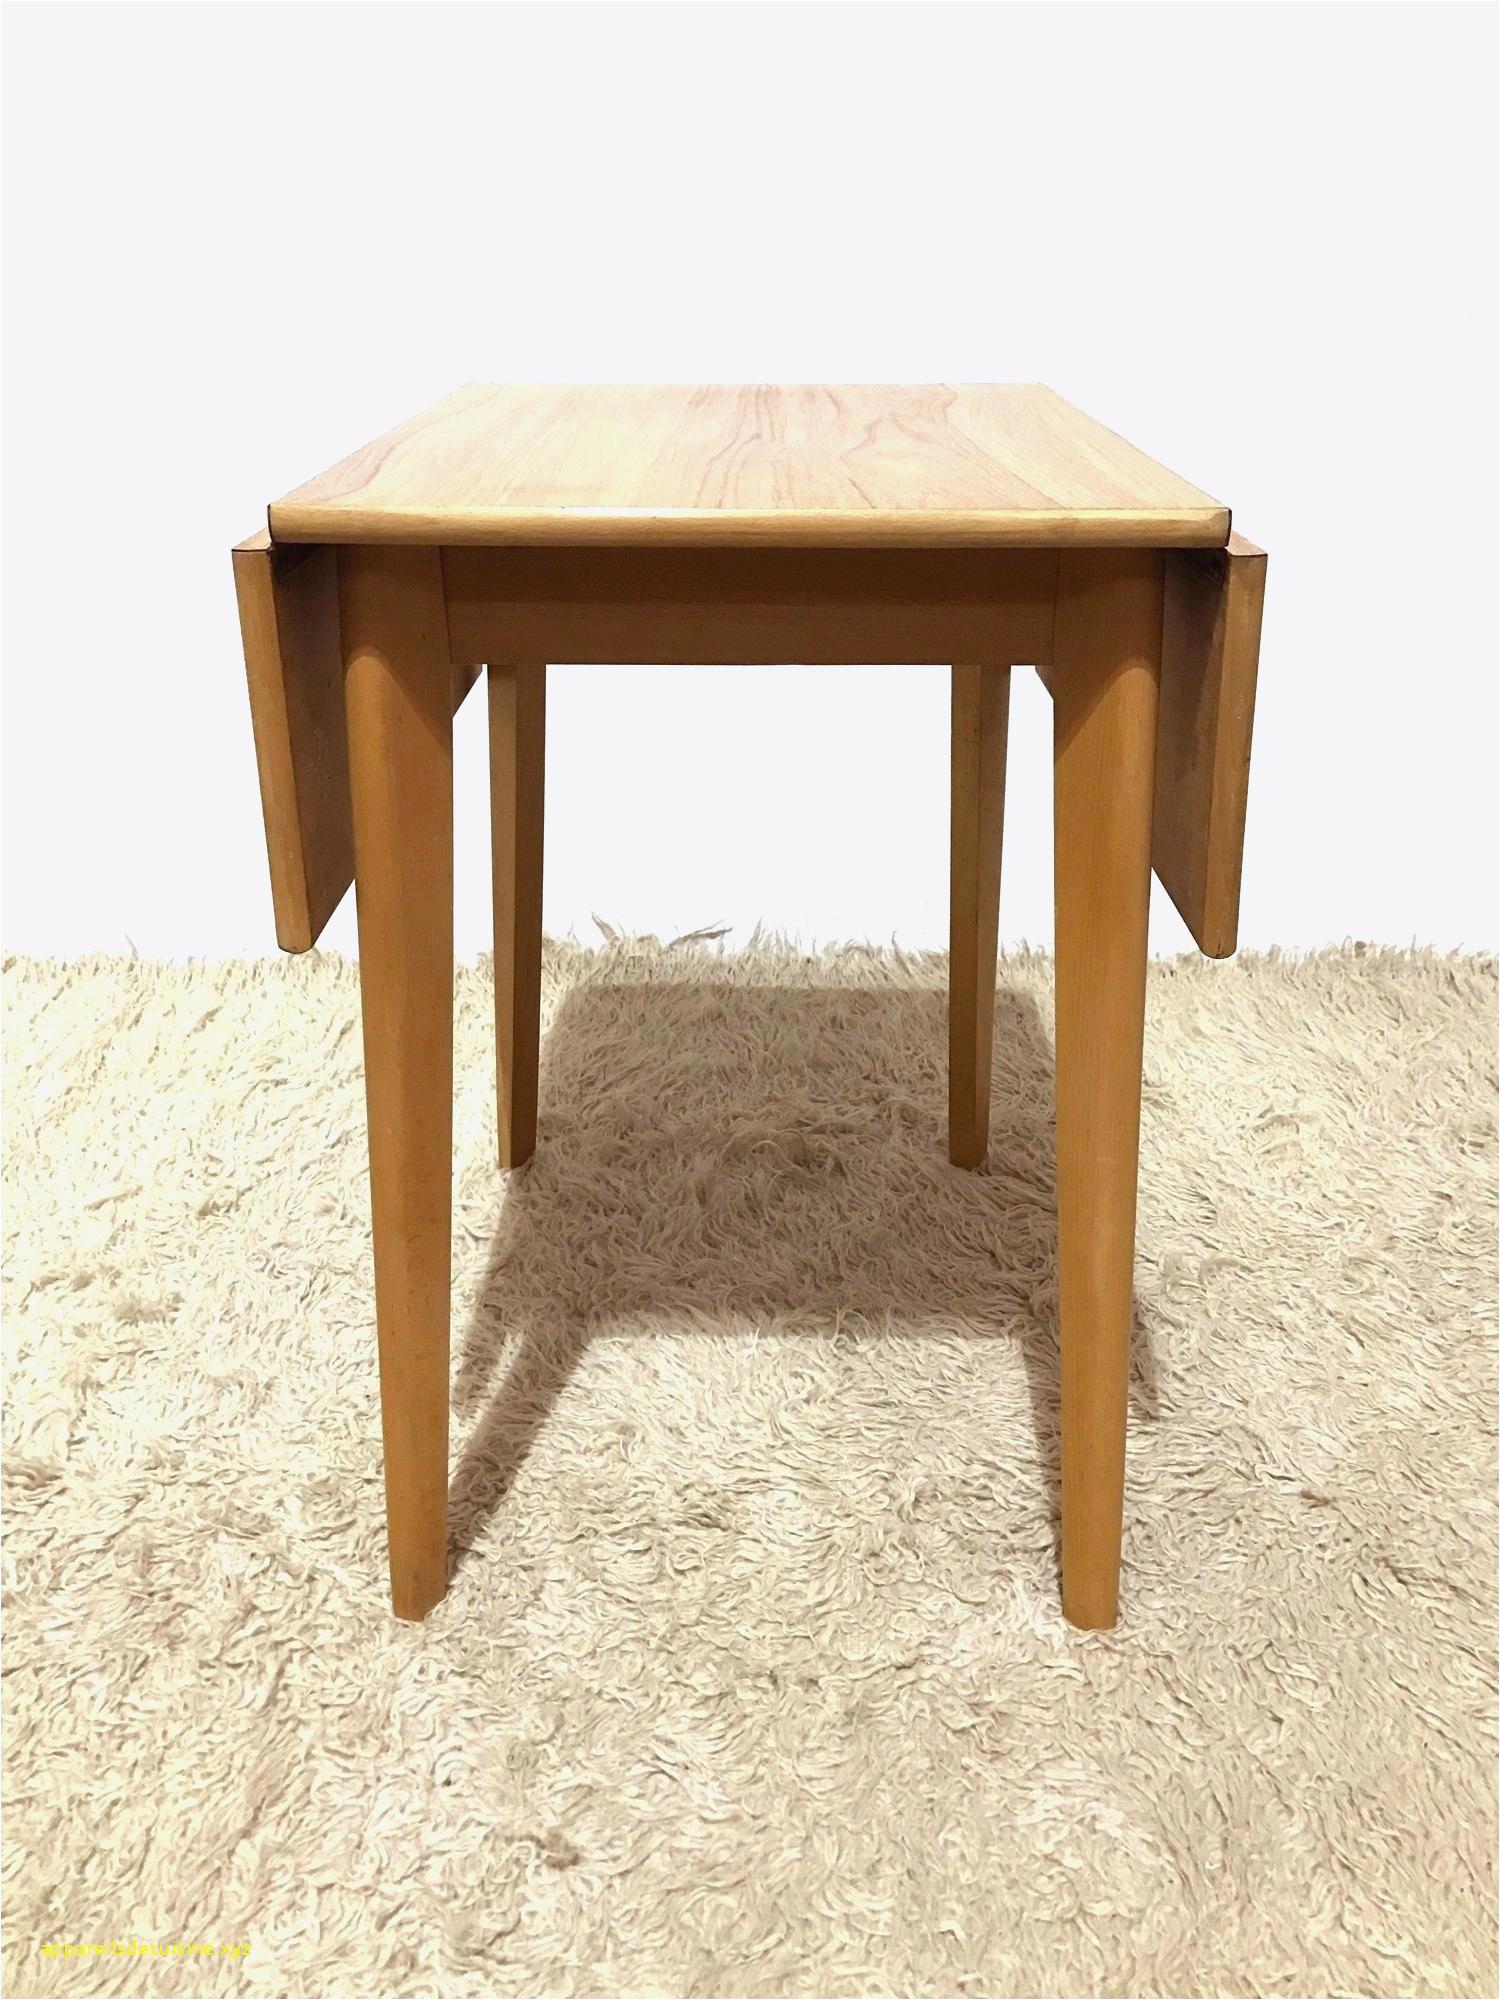 Petite Table Ronde Pliante Luxe Galerie Table Ronde Contemporaine Inspirant Table Ronde Contemporaine